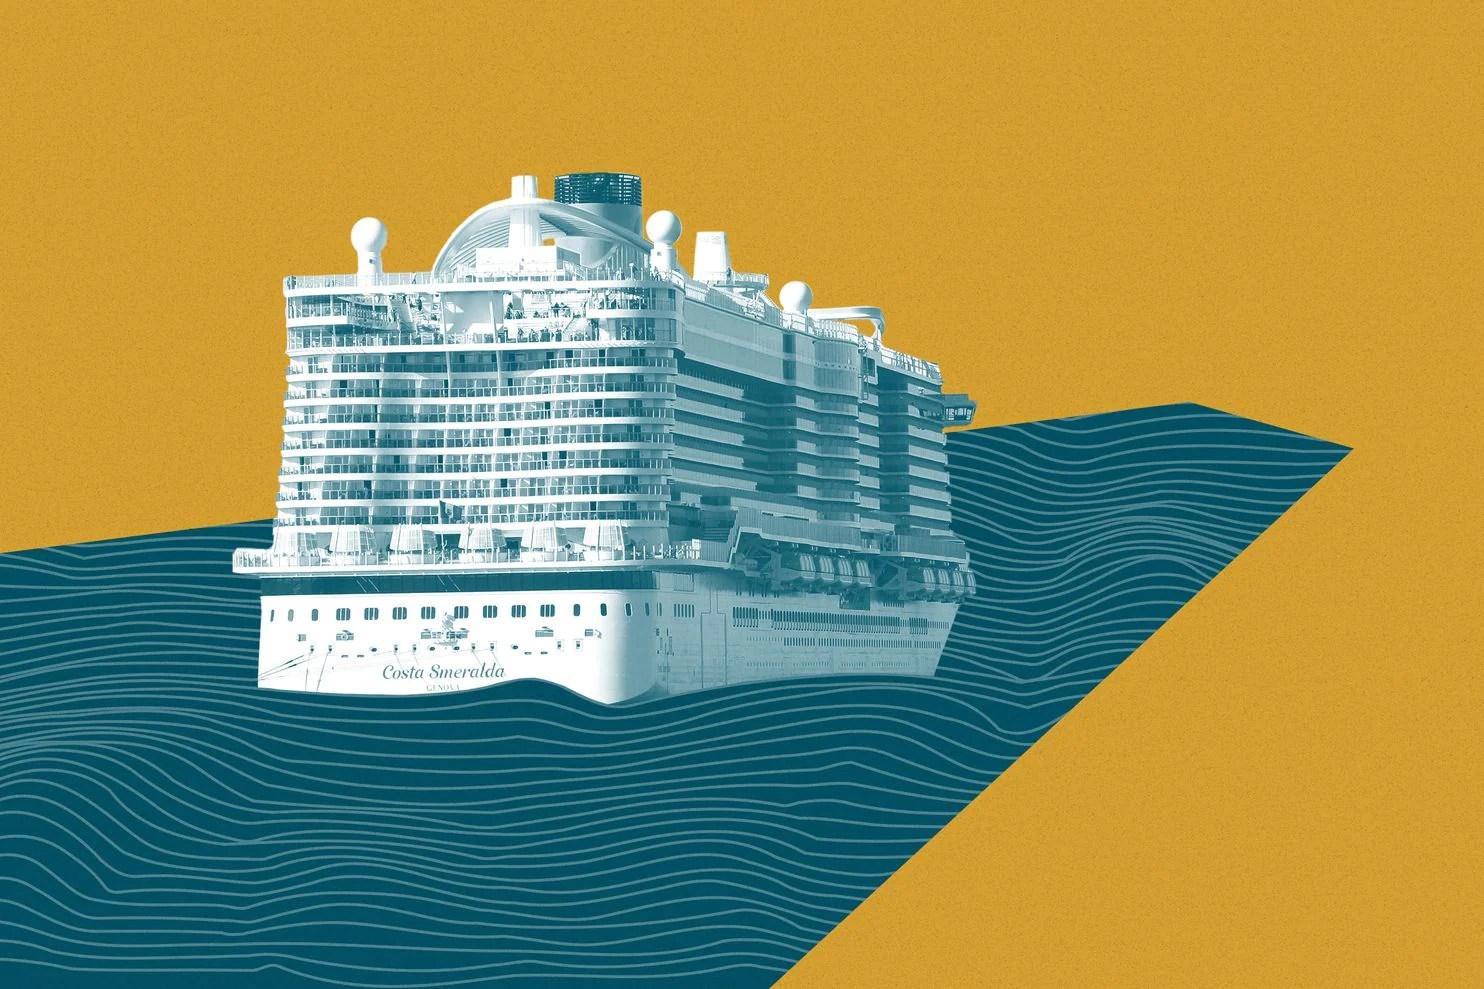 Cruise ship passengers quarantined in Italy over coronavirus fears ...